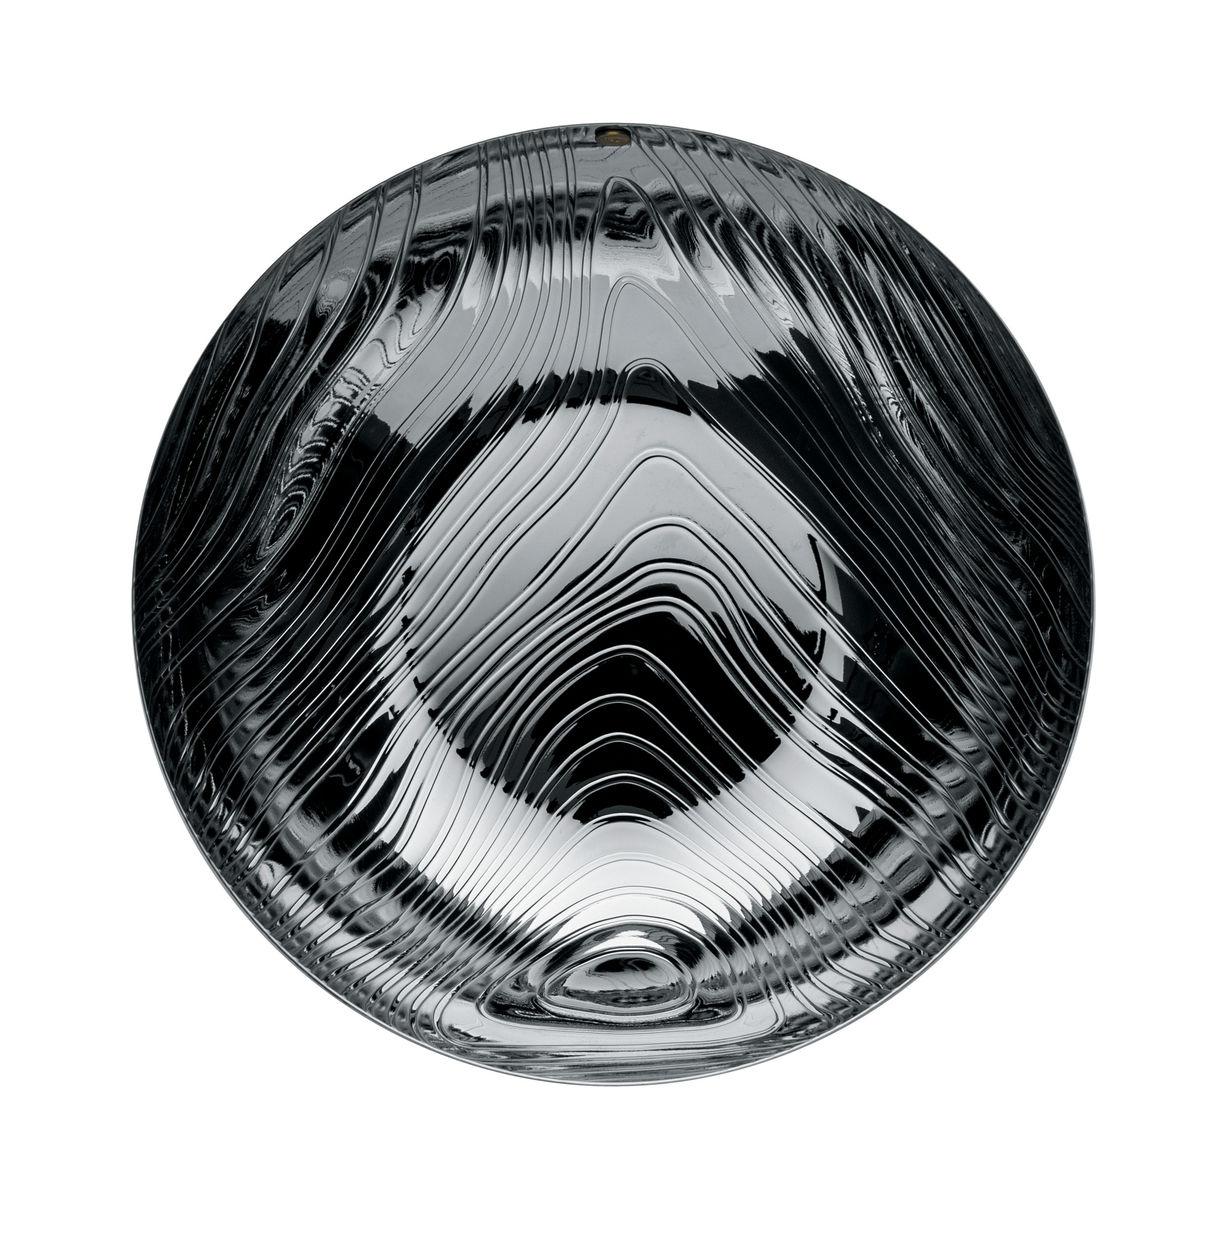 PU06 Veneer Bowl Alessi